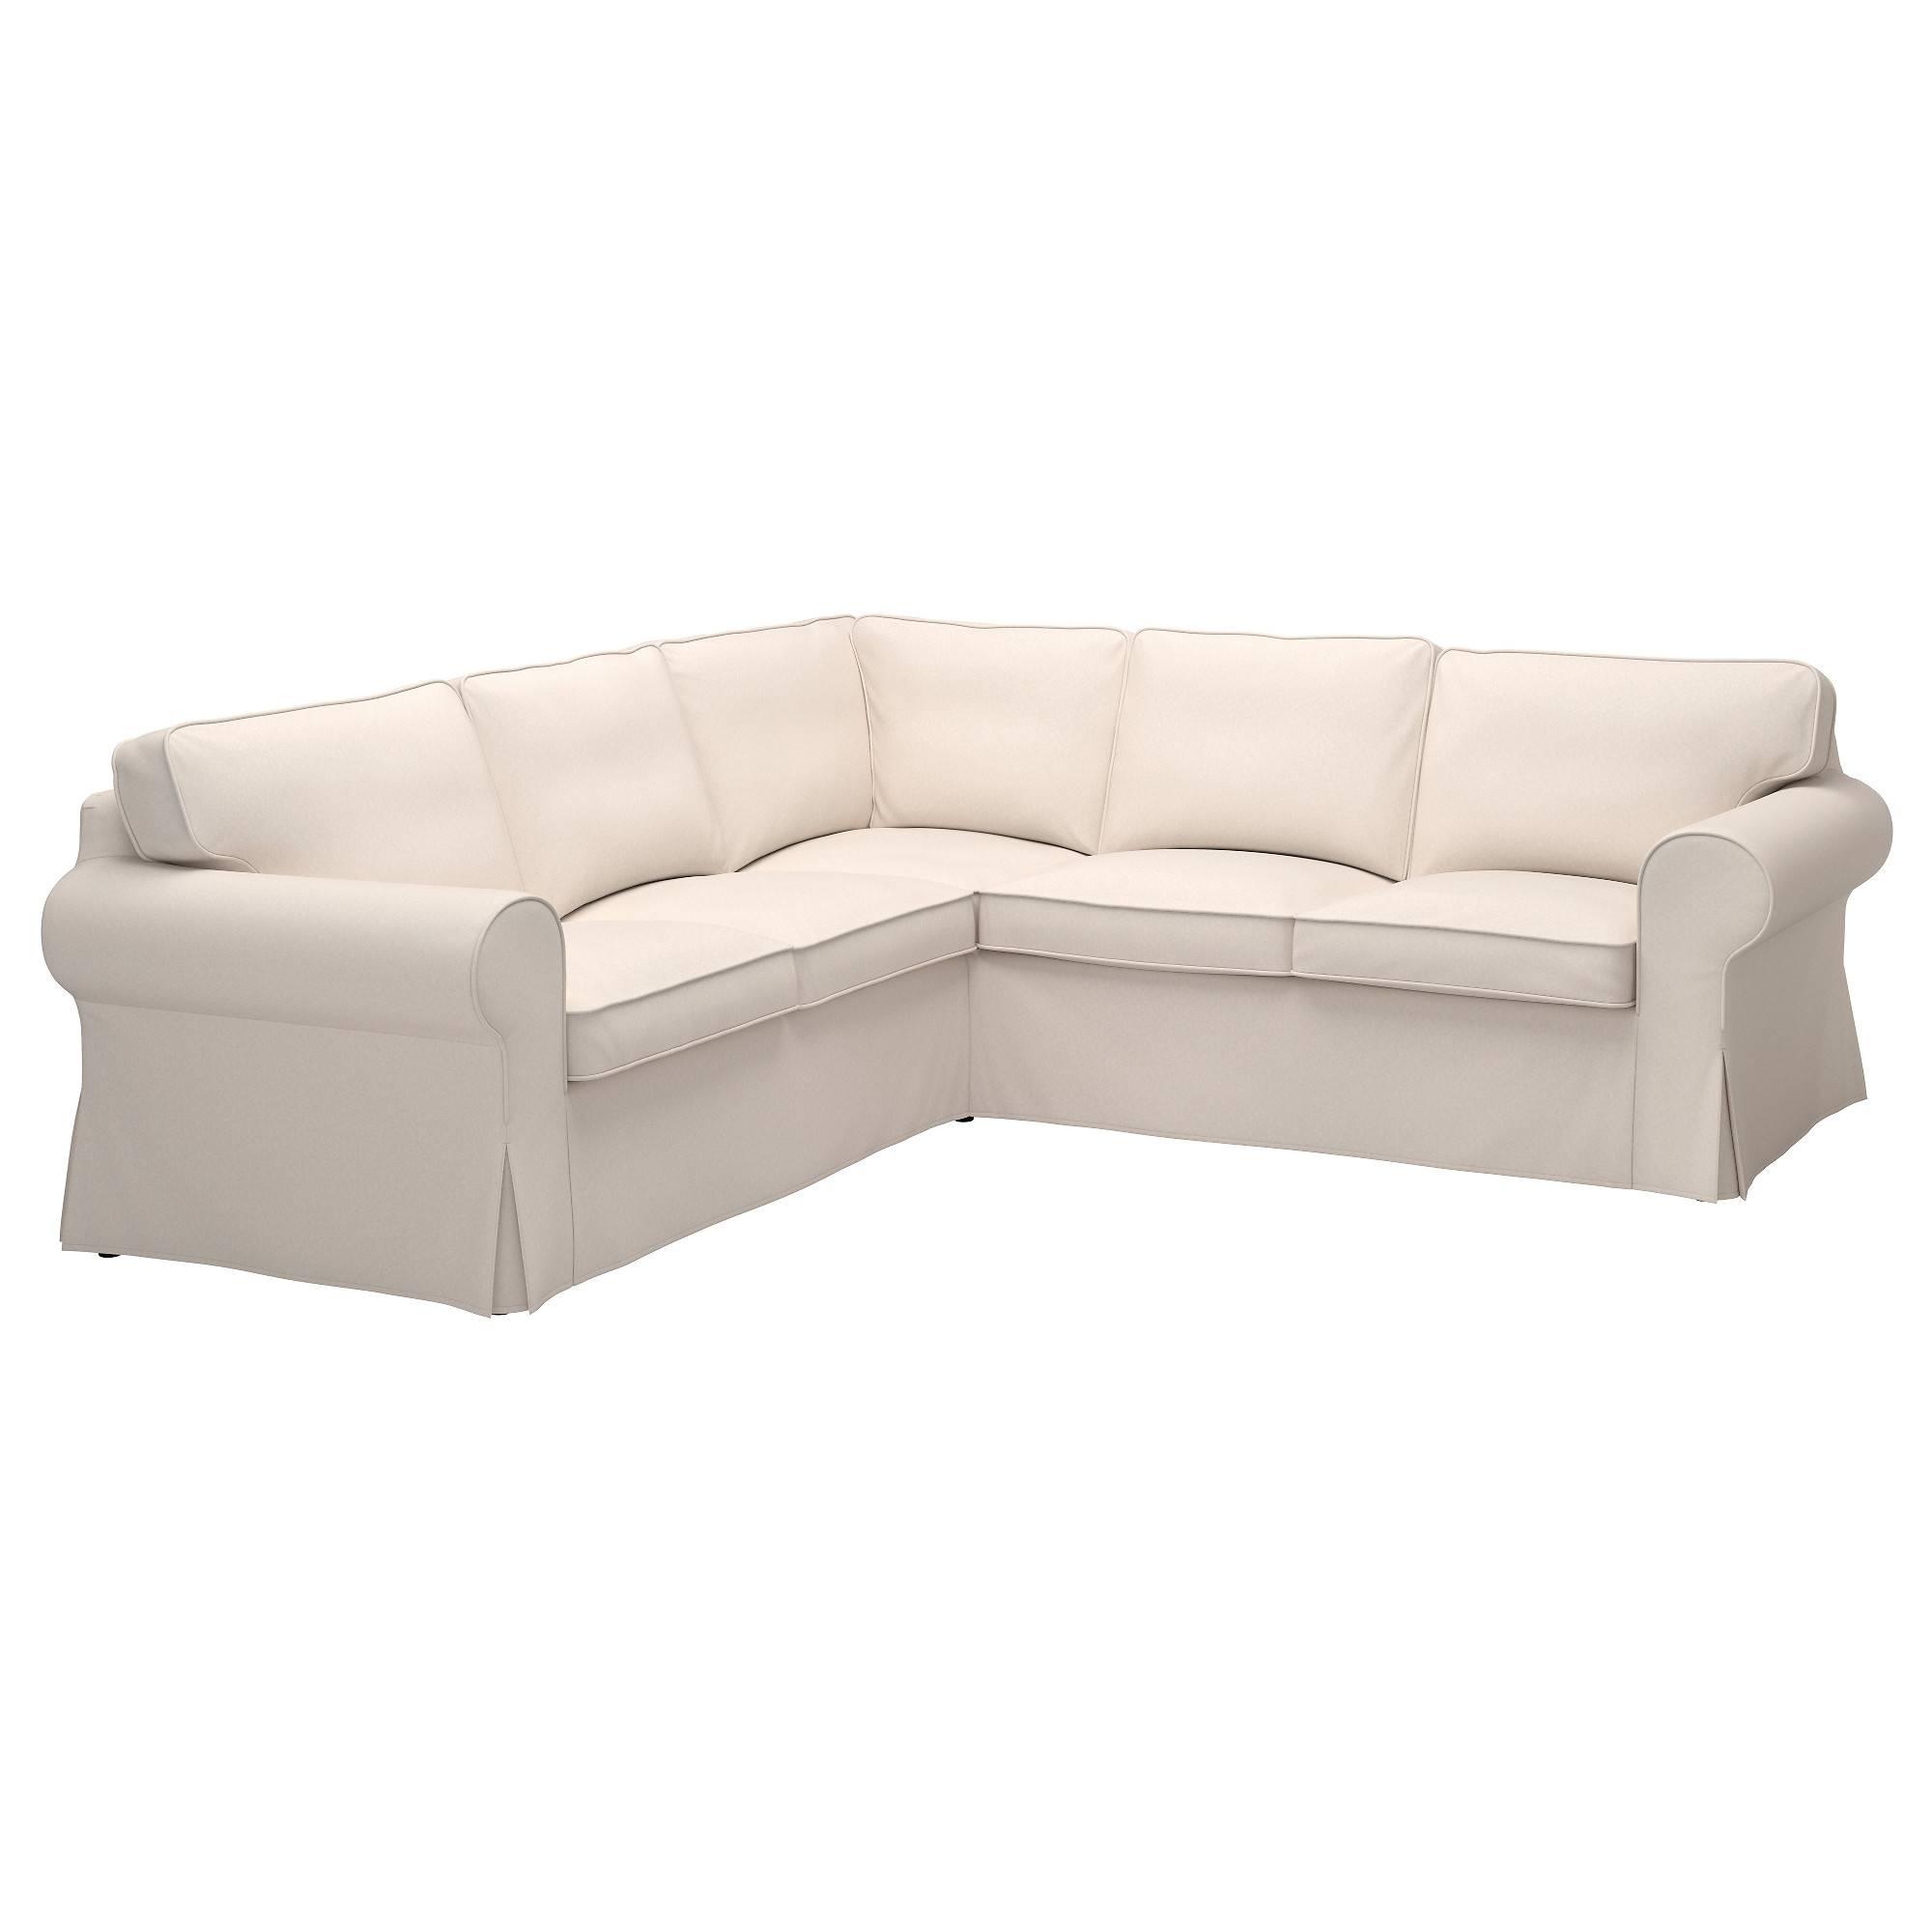 Ektorp Cover For 4-Seat Corner Sectional - Lofallet Beige - Ikea pertaining to 2X2 Corner Sofas (Image 7 of 30)